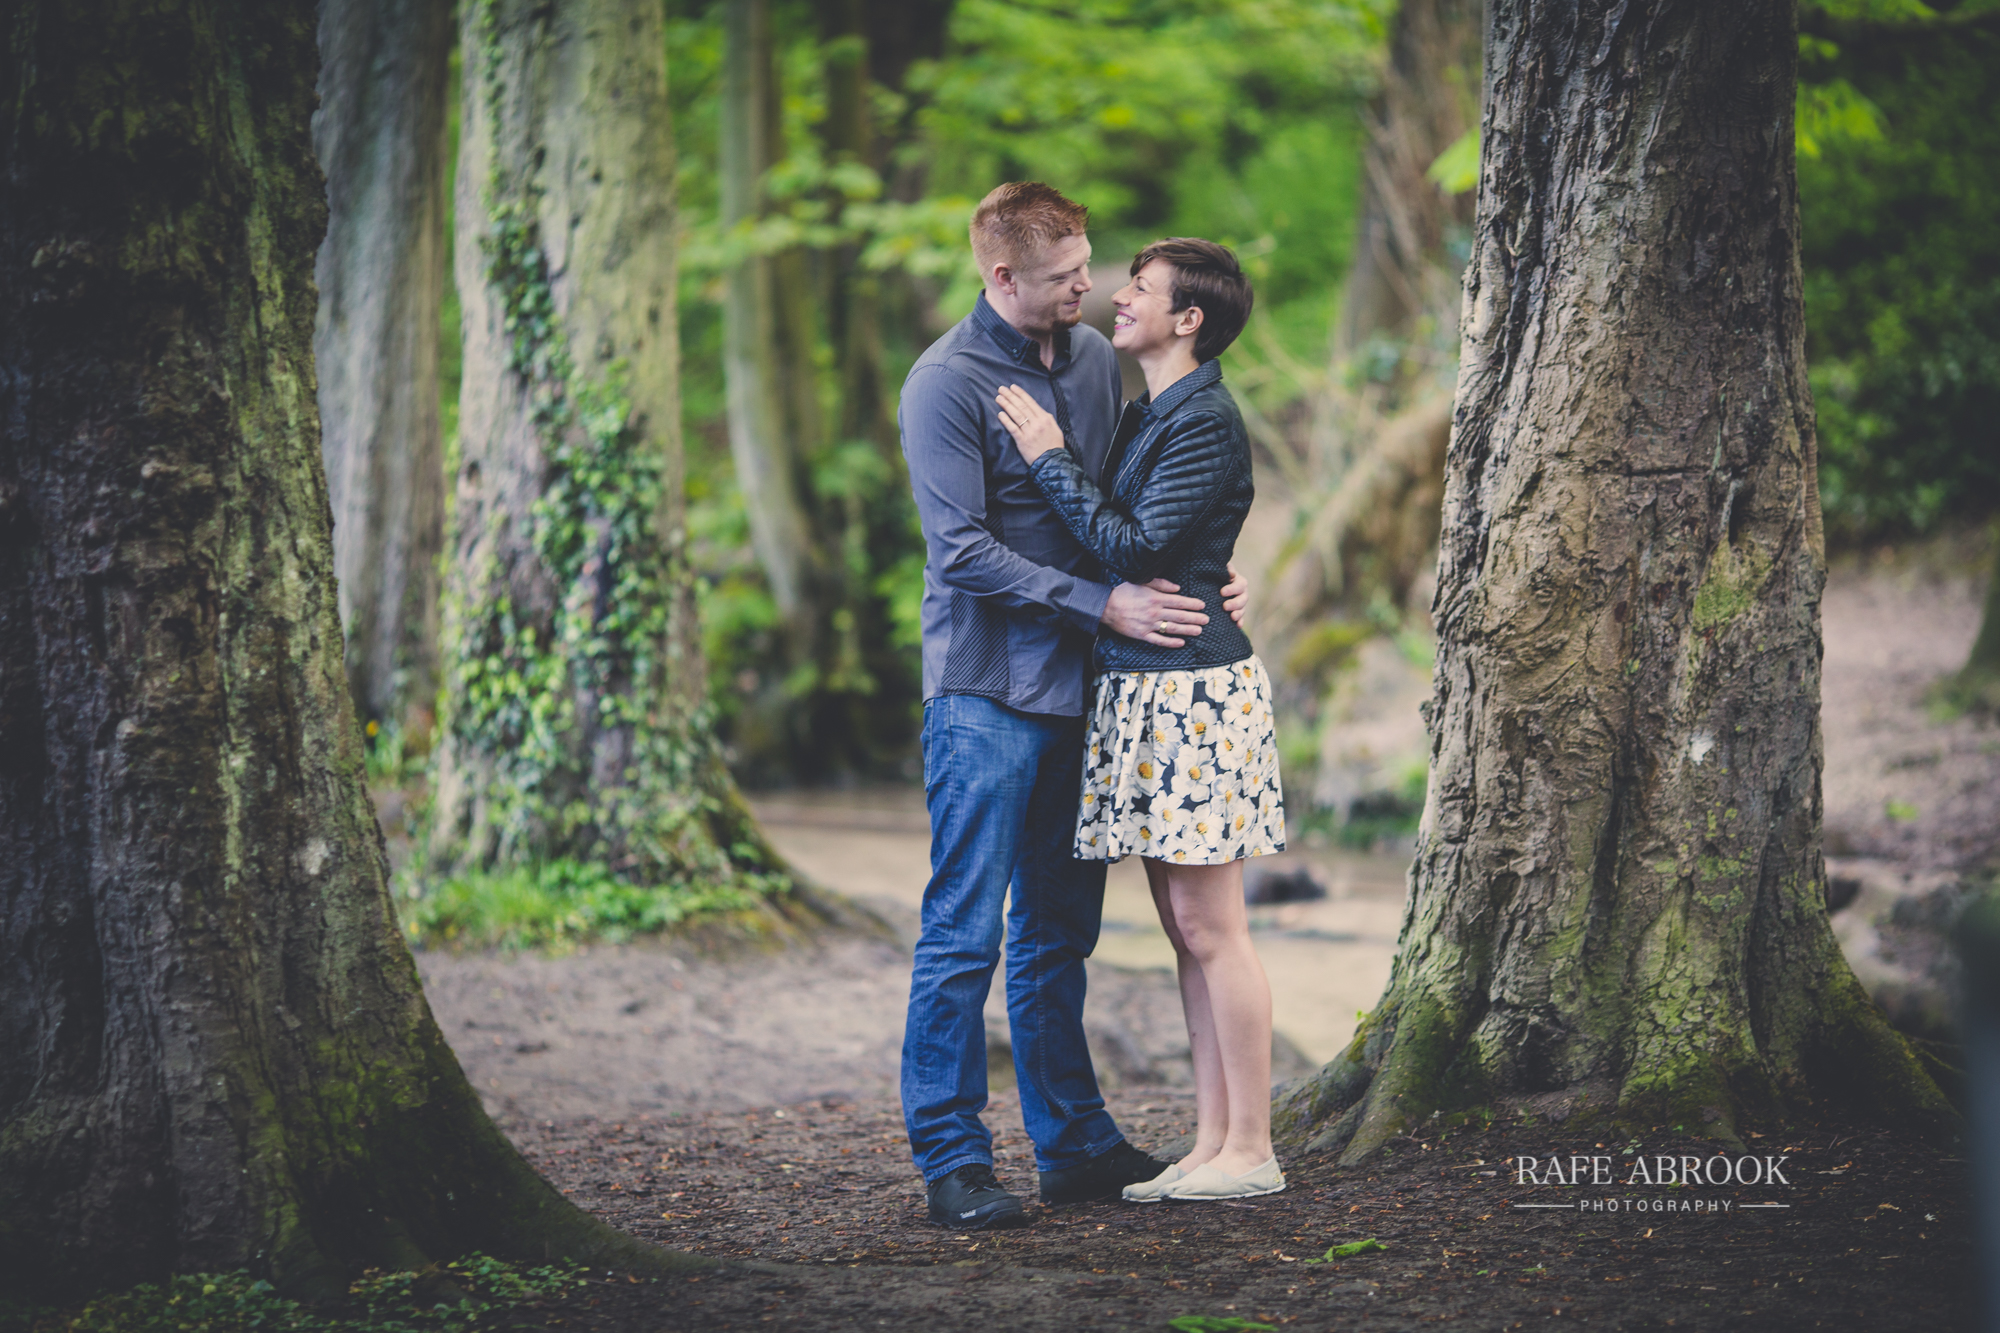 miriam & craig engagement shoot barton hills springs bedfordshire-1004.jpg